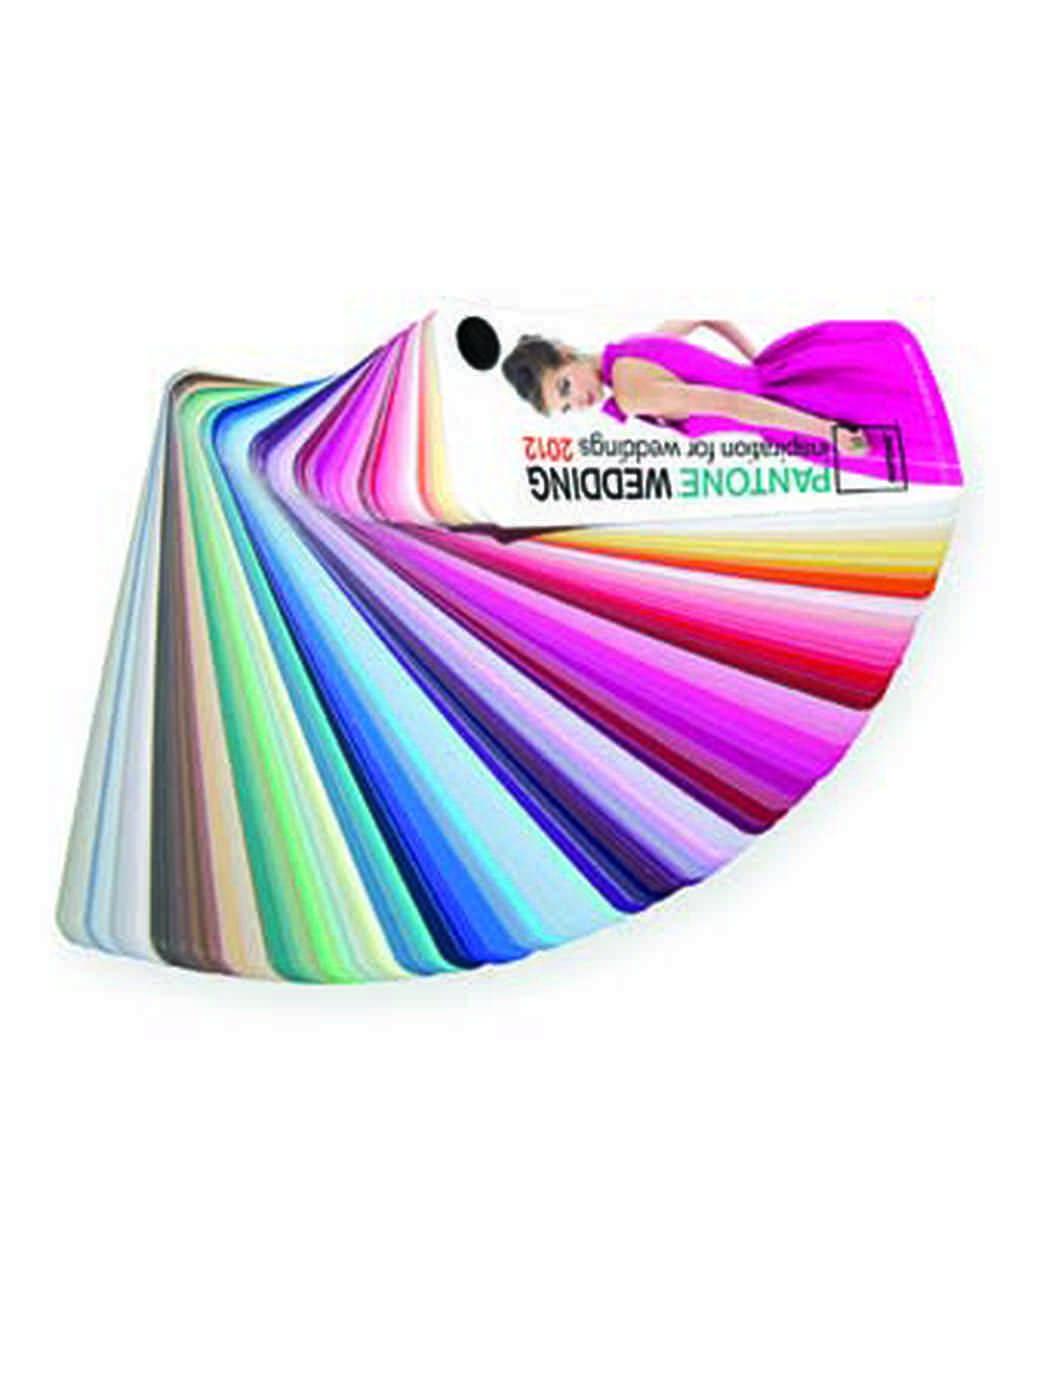 pantone-bridesmades-color-inspiration-tools-dessy-6.jpg